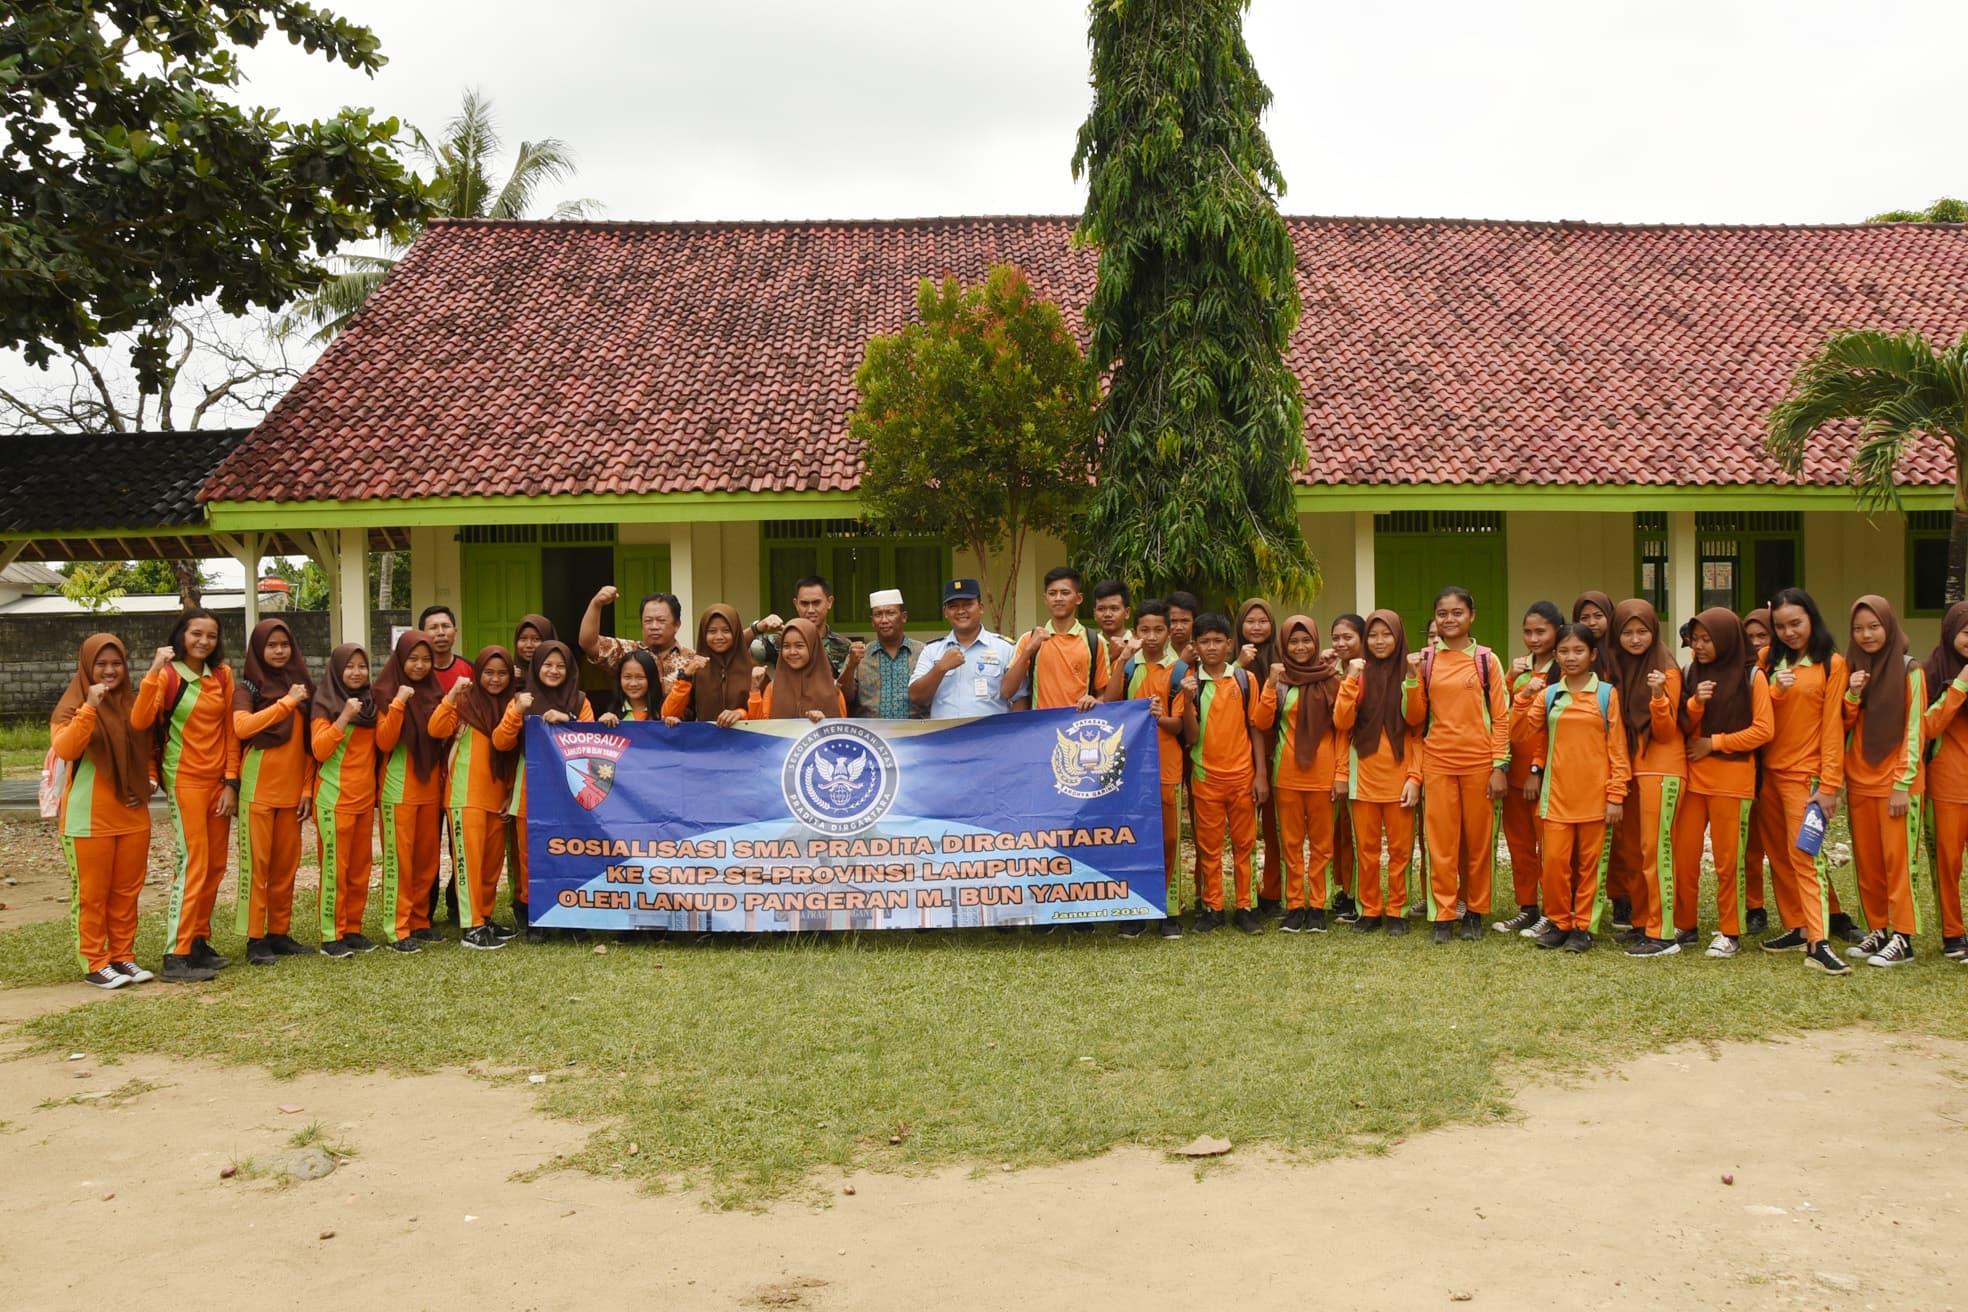 Lanud Pangeran M. Bun Yamin Mensosialisasikan SMA Pradita Dirgantara ke SMPN se-Kabupaten Tulang Bawang.